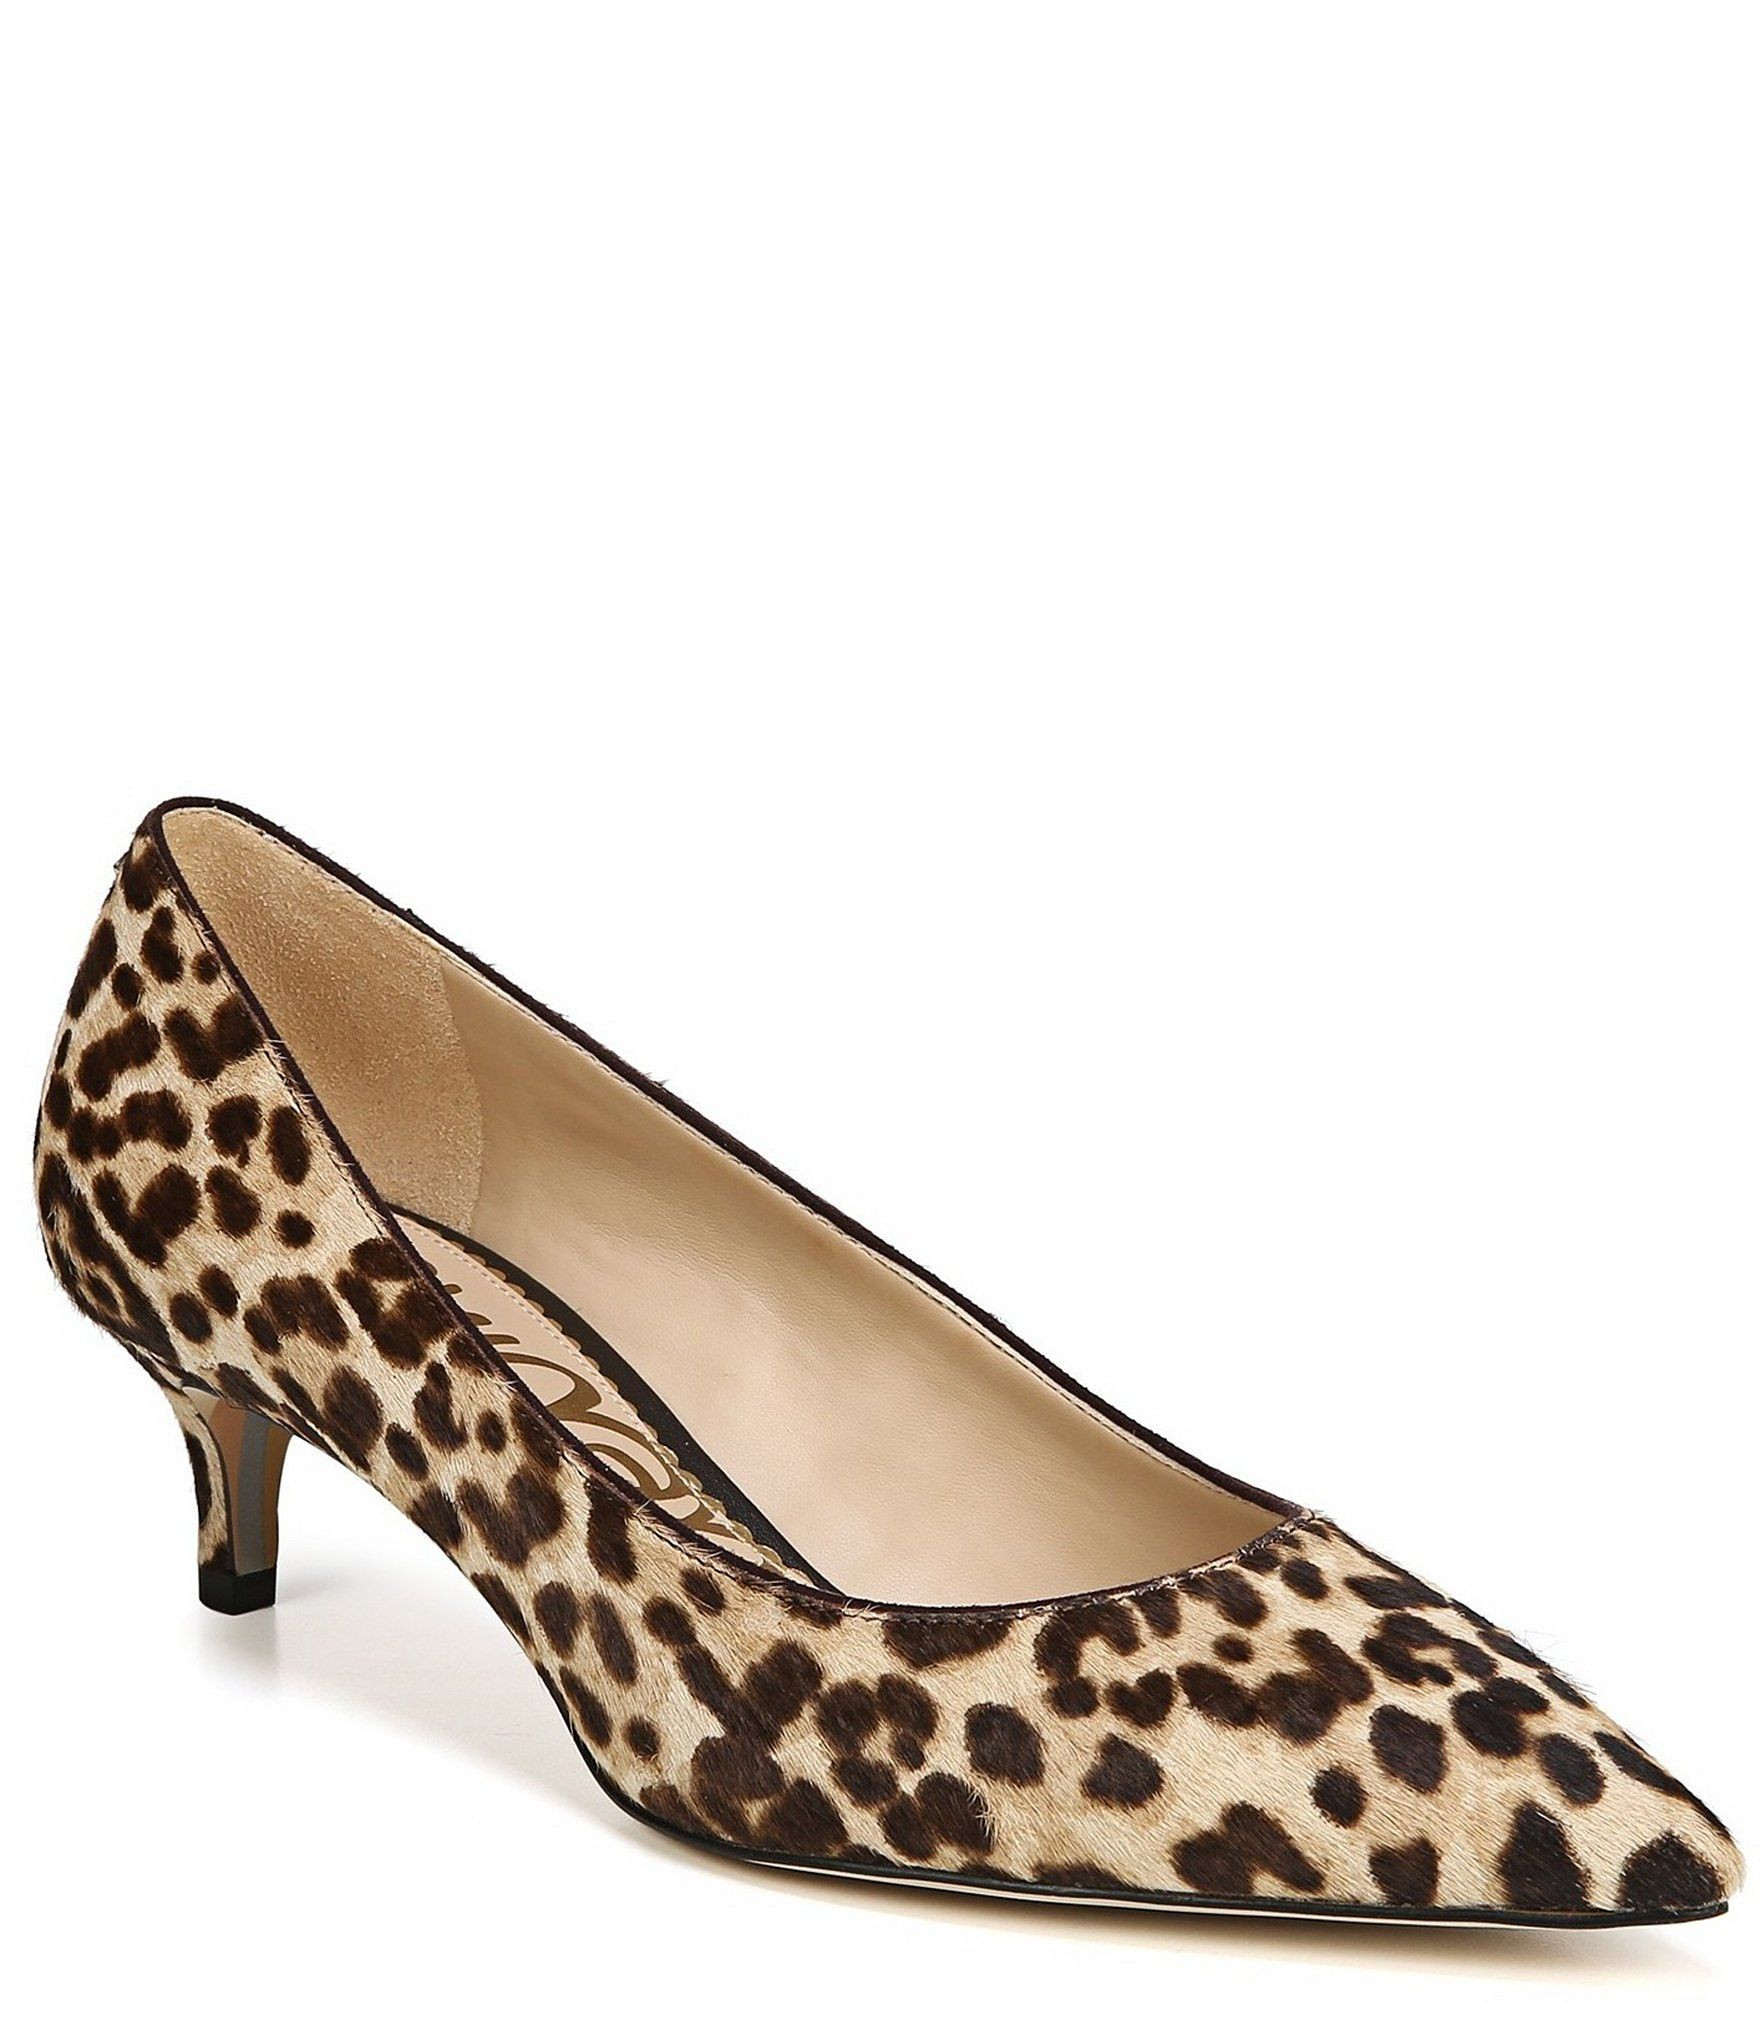 Sam Edelman Dori Leopard Print Kitten Heel Pumps Dillards Kitten Heels Kitten Heel Pumps Sam Edelman Shoes